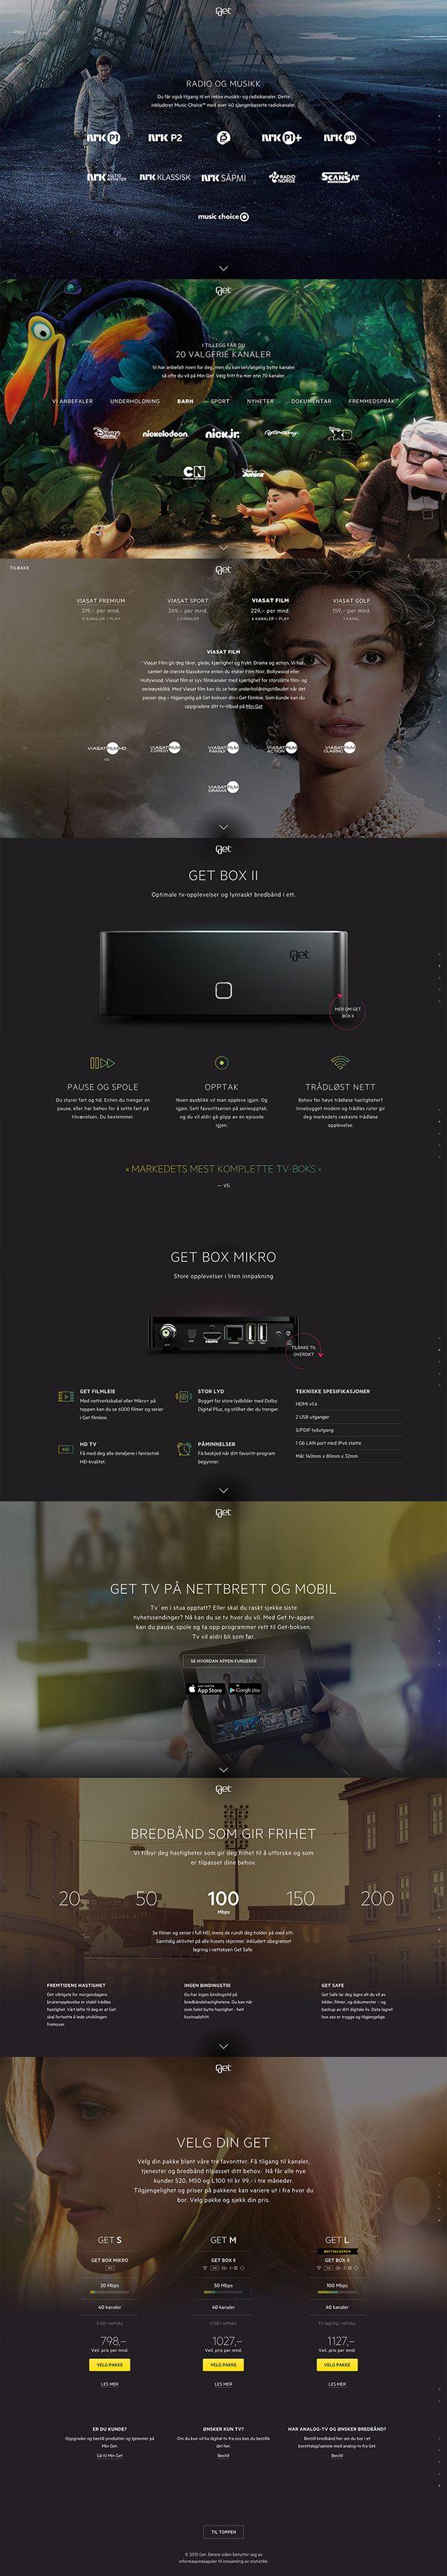 GET website on Behance